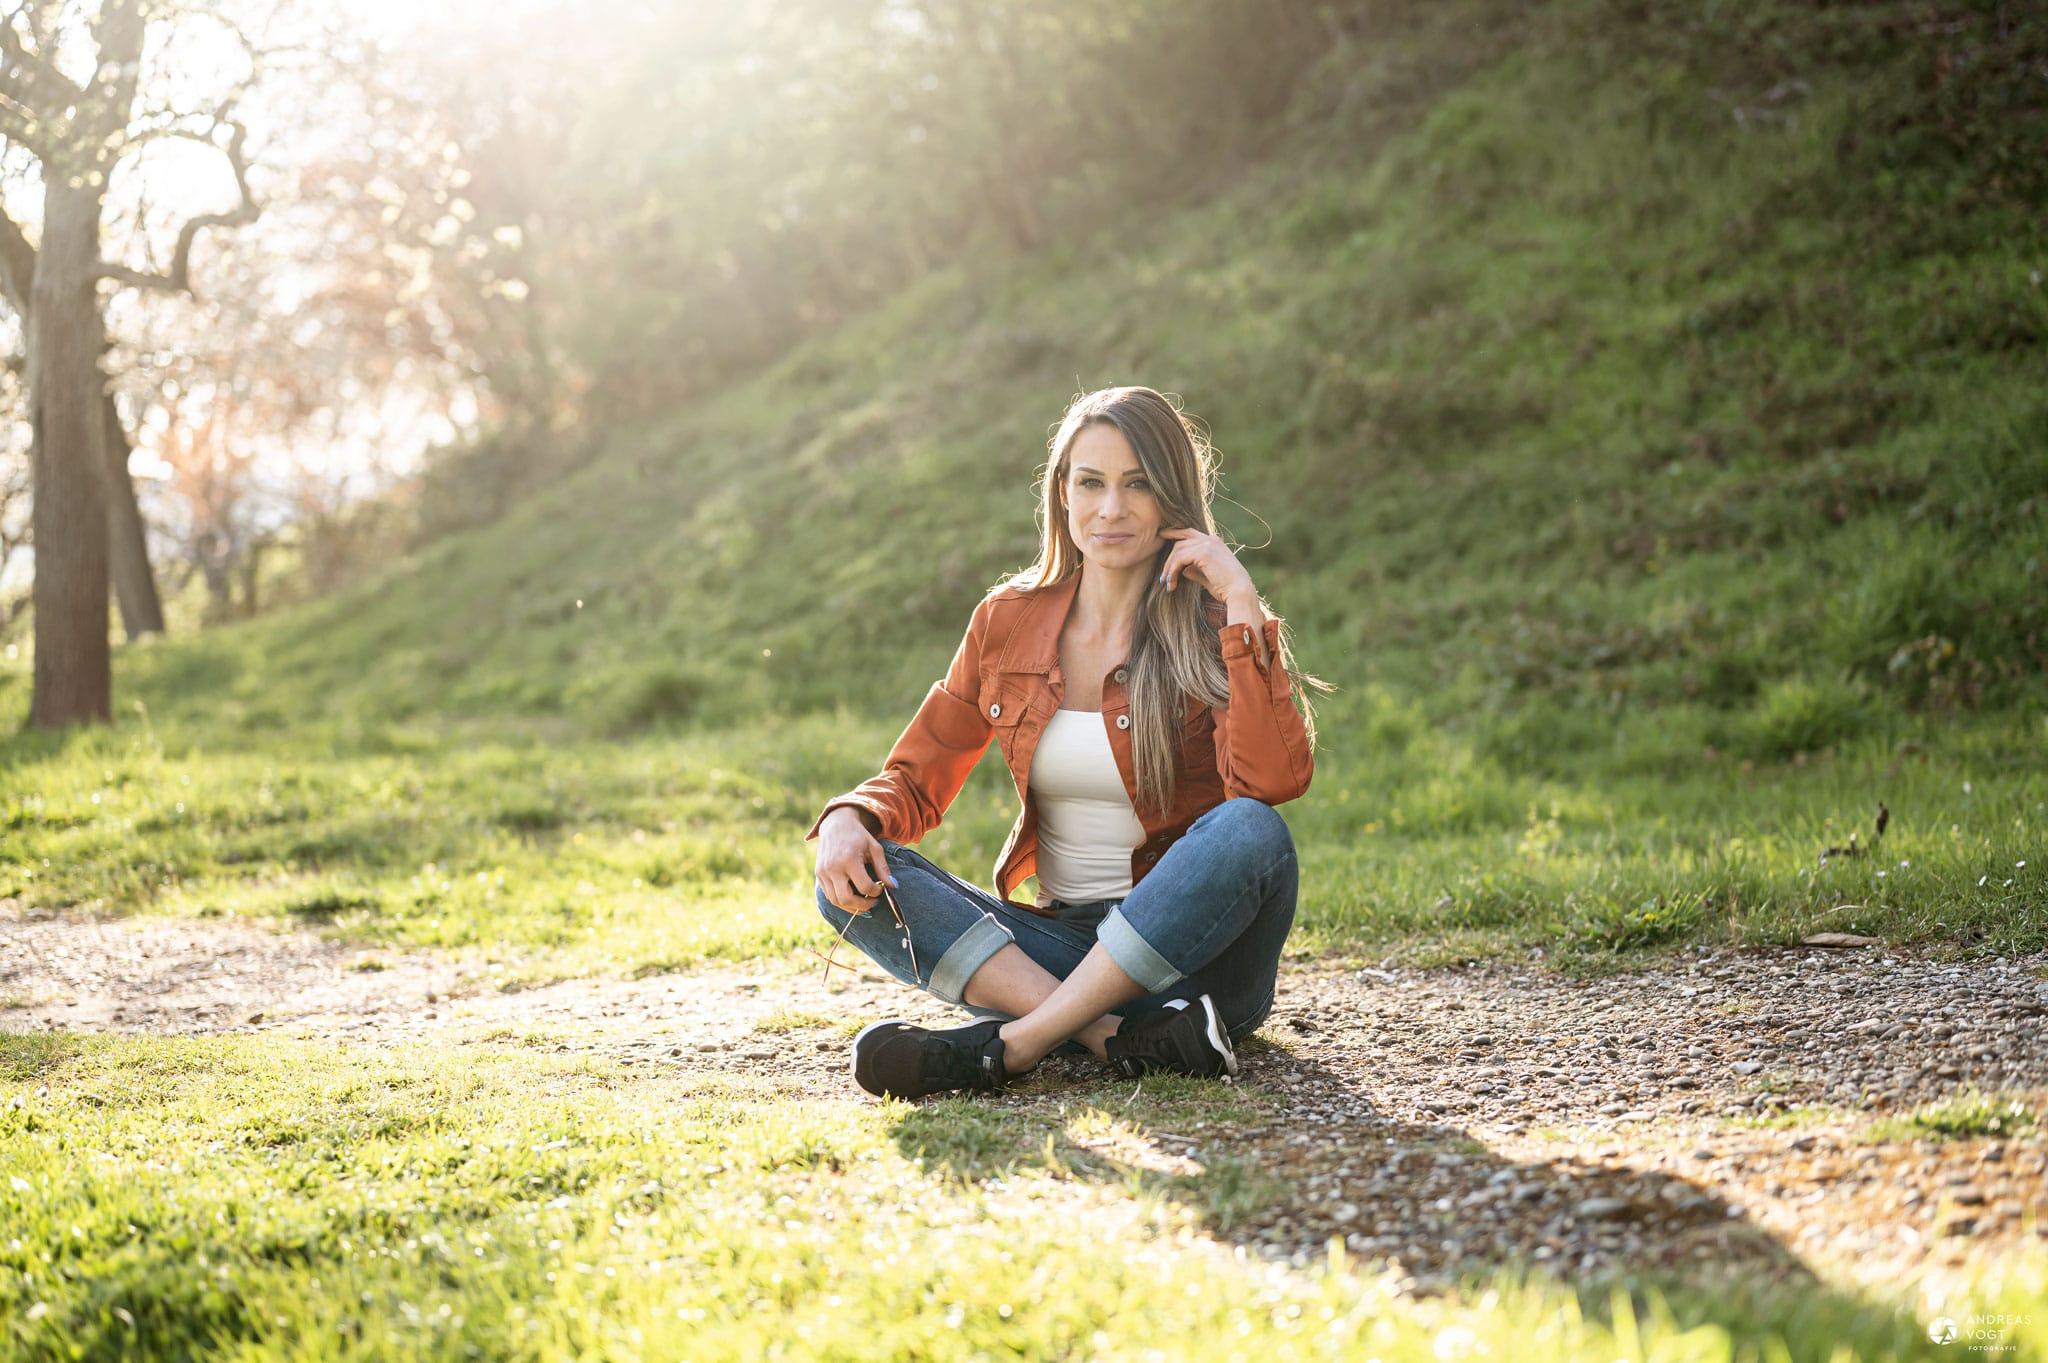 Stephanie Fotoshooting bei Sonnenuntergang in Ellwangen - Fotograf Andreas Vogt